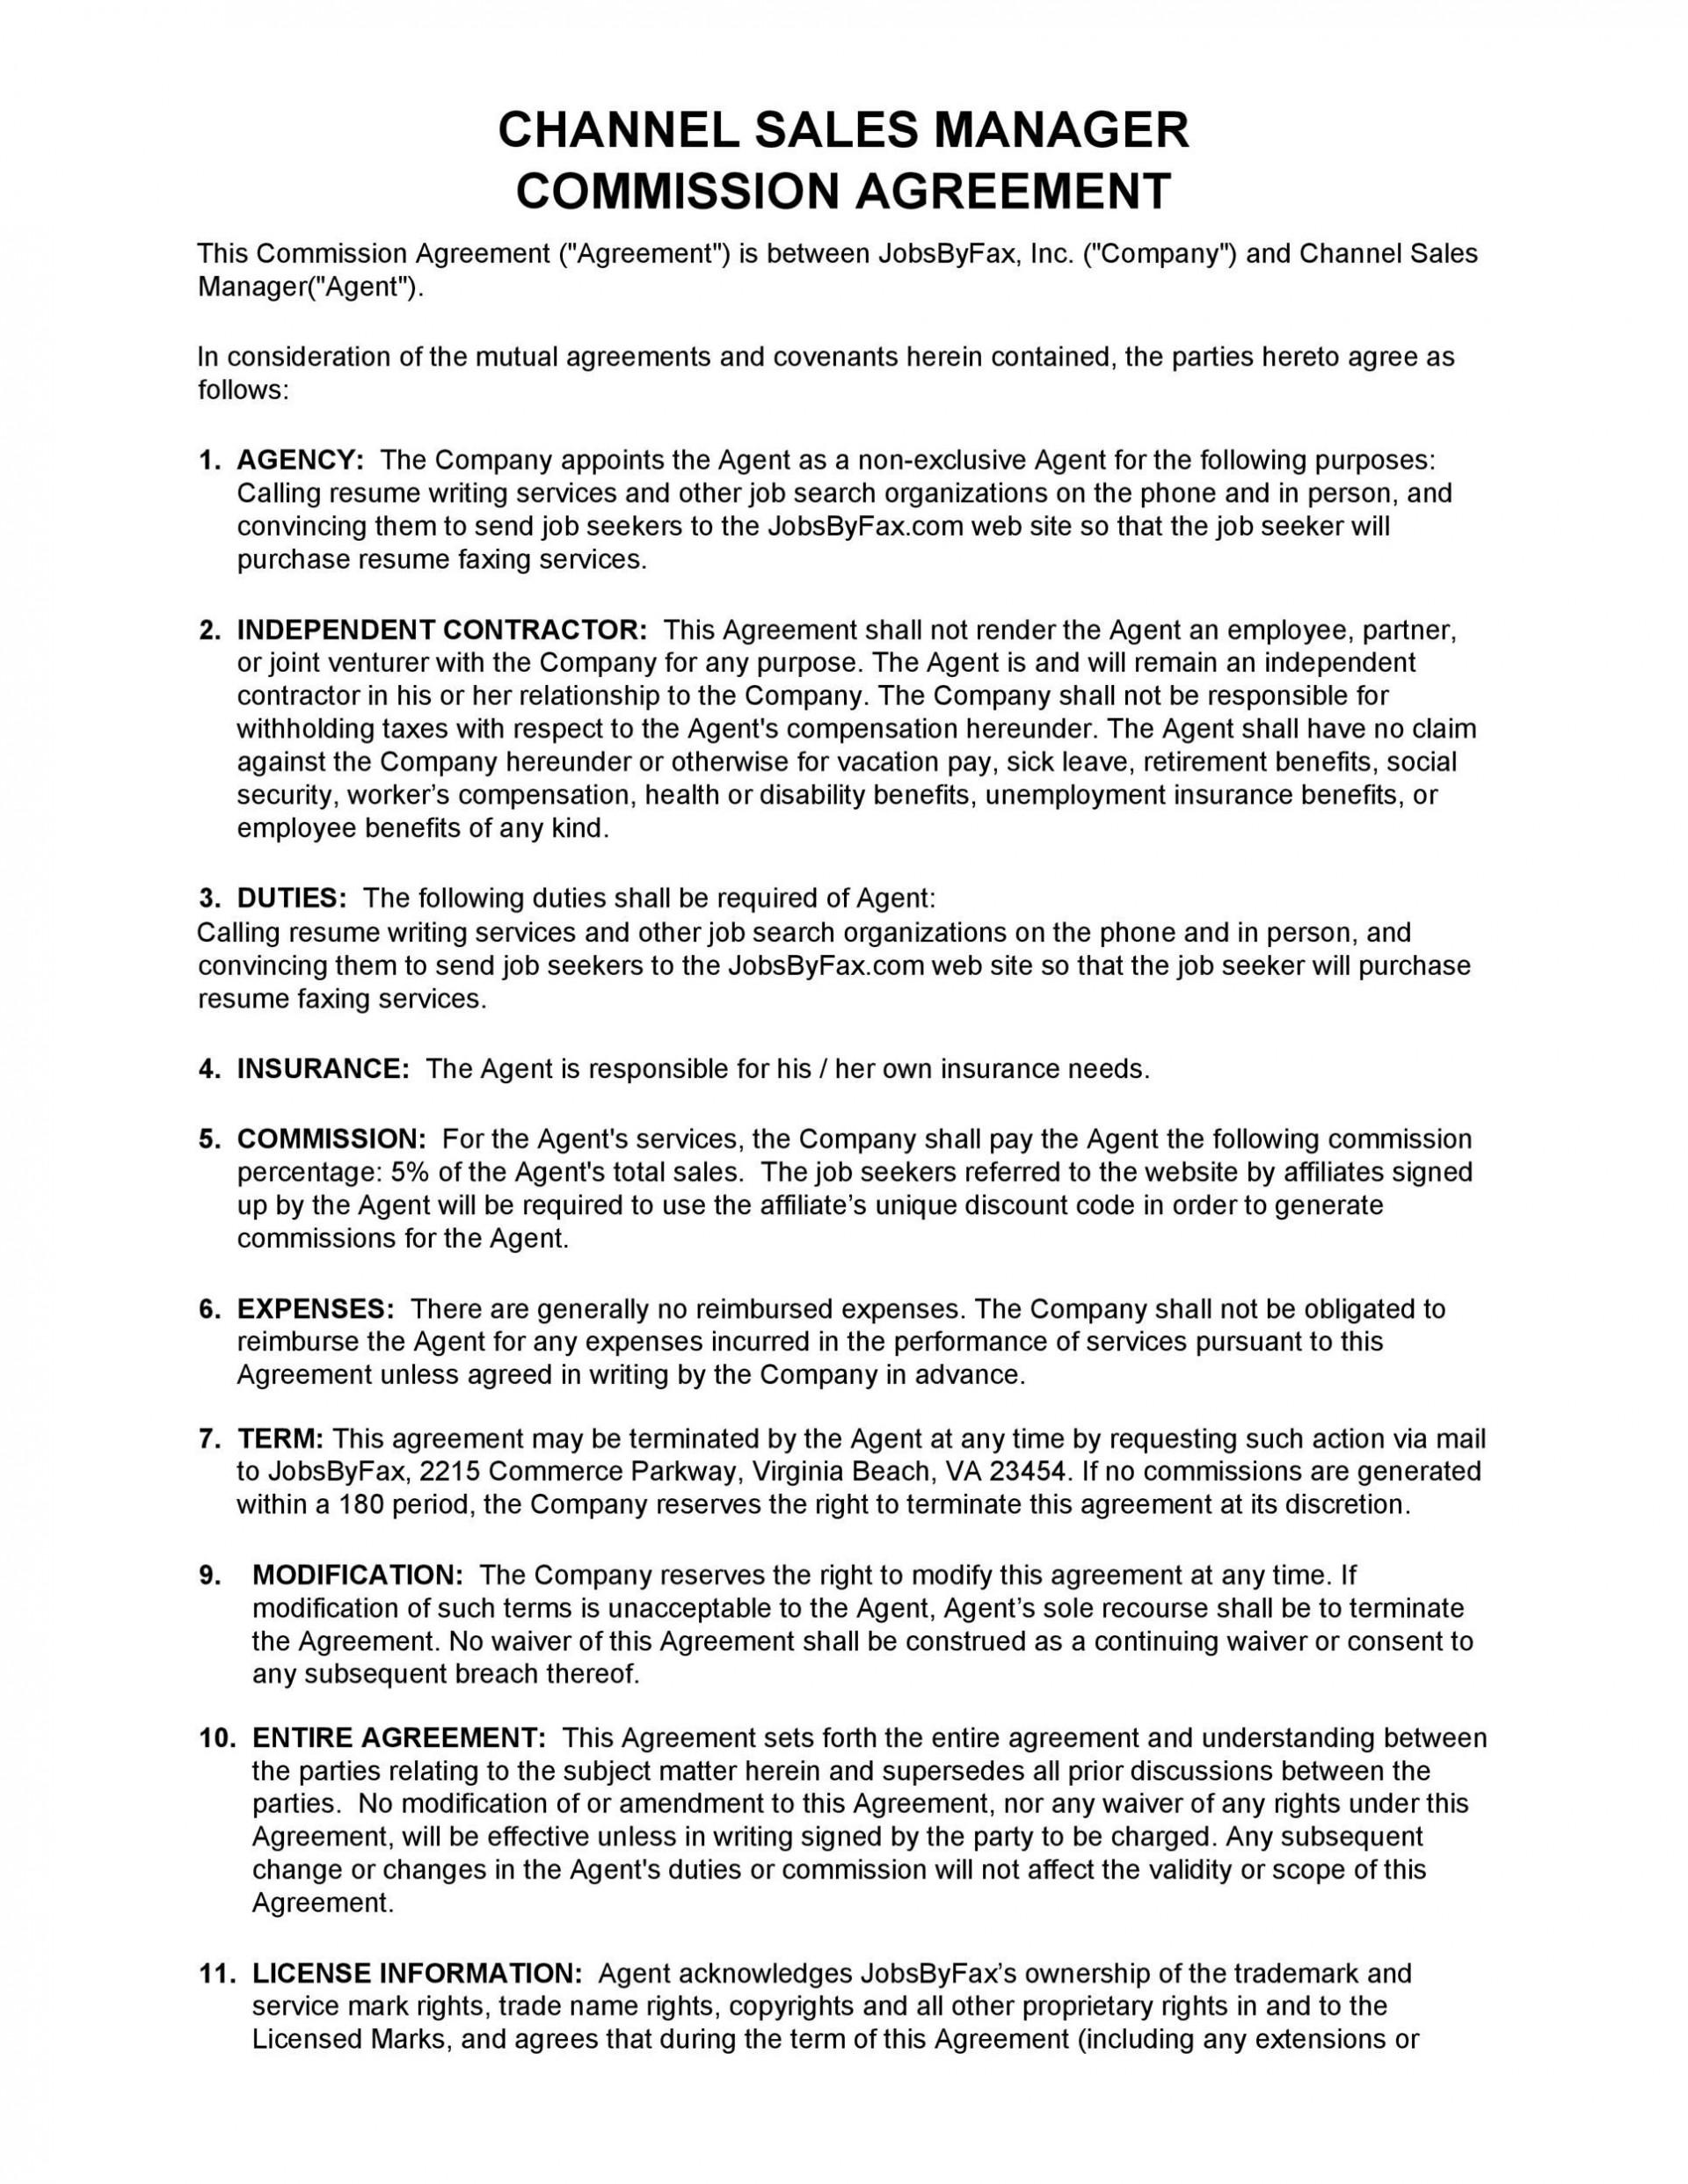 007 Unusual Sale Agreement Template Australia Picture  Busines Horse Car Contract1920